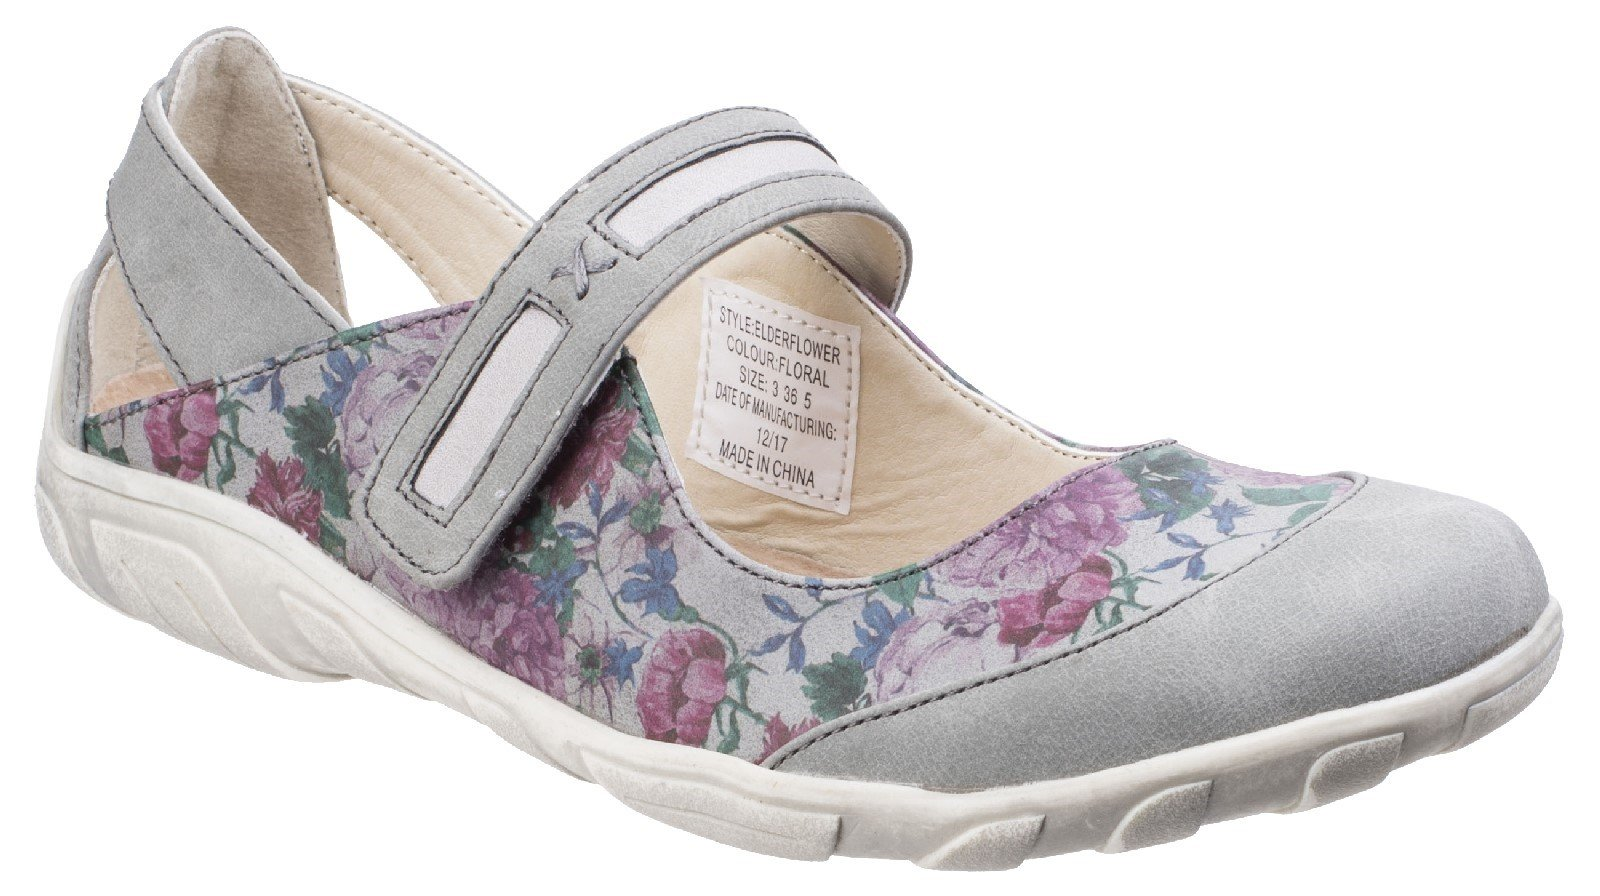 Fleet & Foster Women's Elderflower Flats Floral 26287-43846 - Floral 3